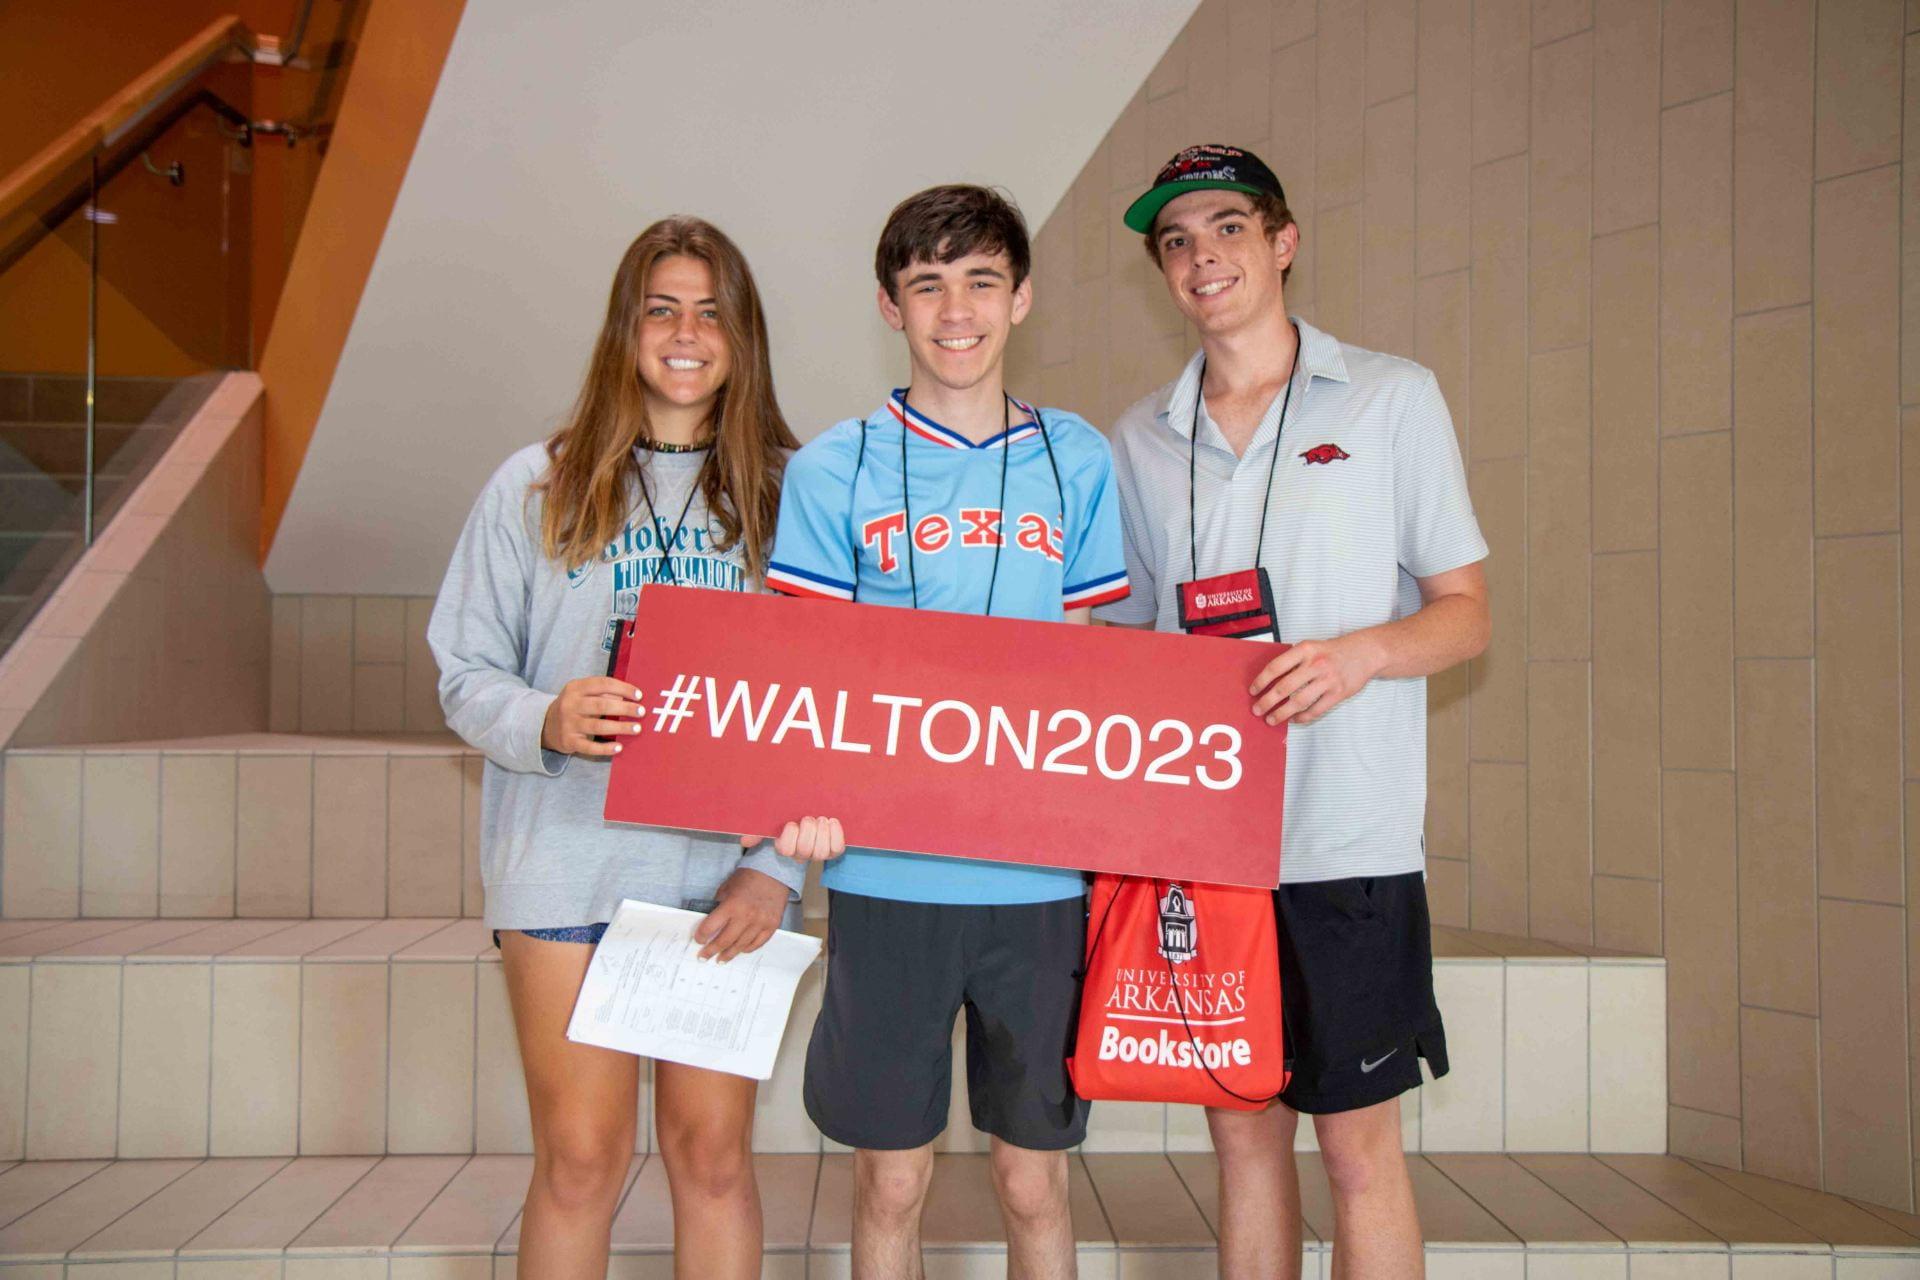 Walton College #walton2023 students